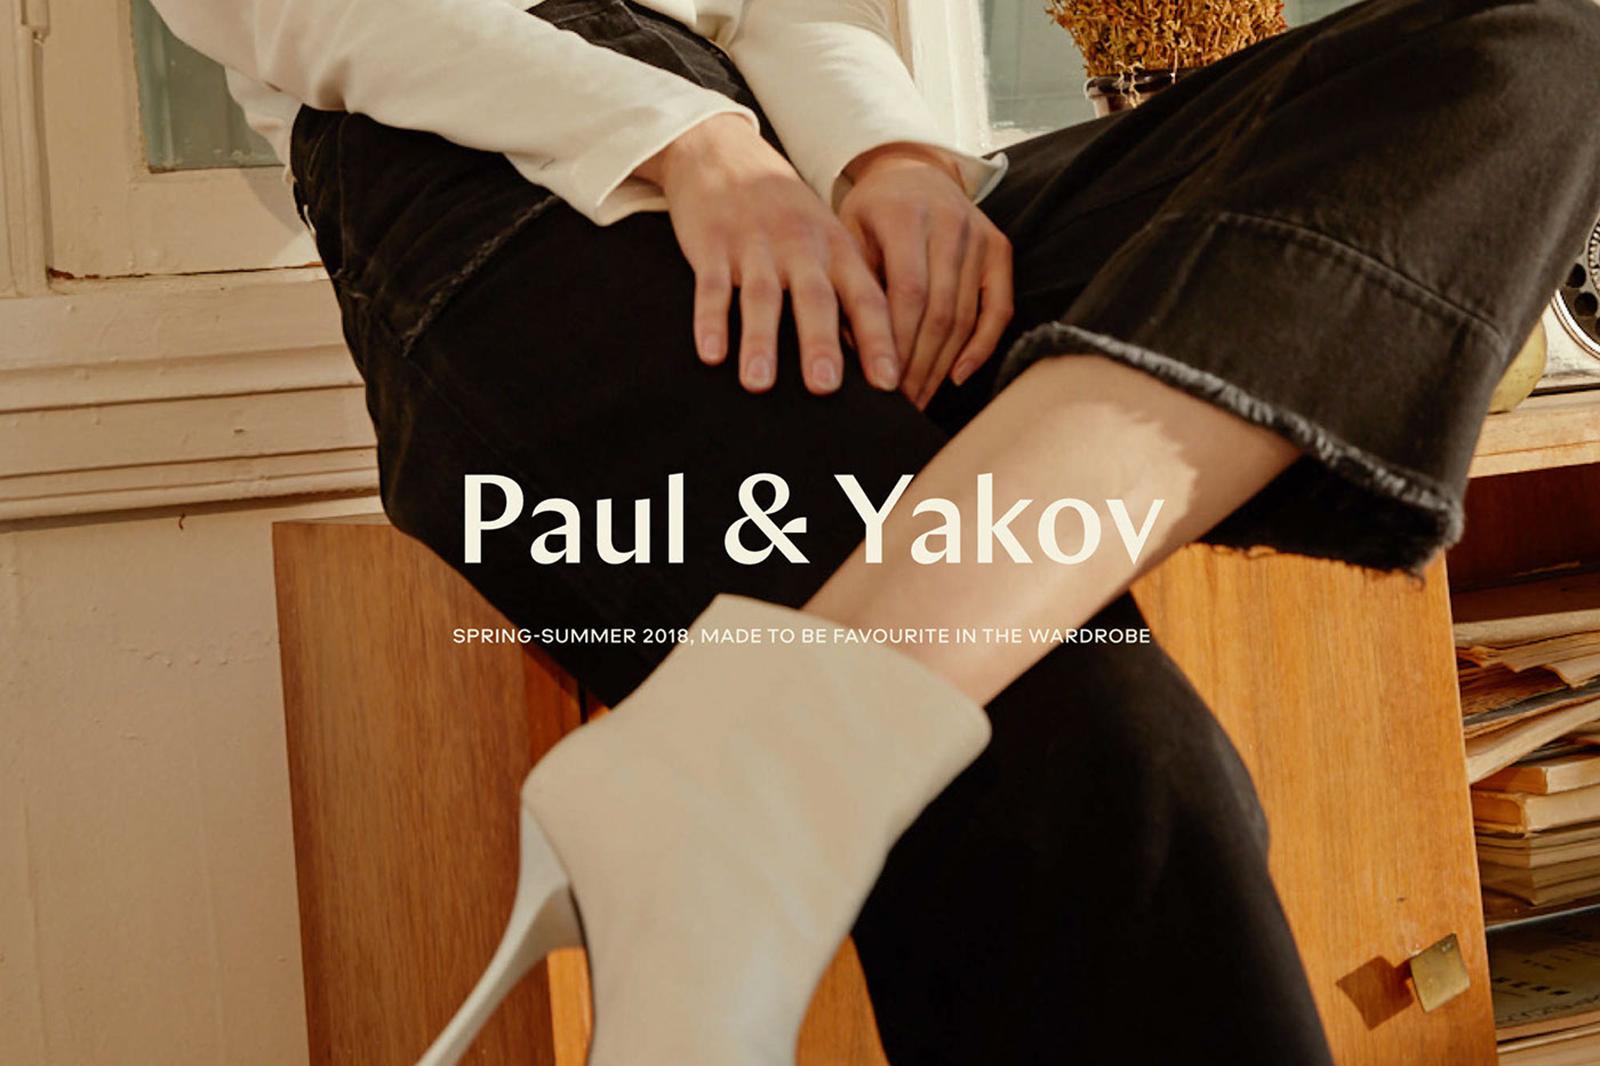 Paul & Yakov 时装品牌视觉VI形象设计欣赏-深圳VI设计1